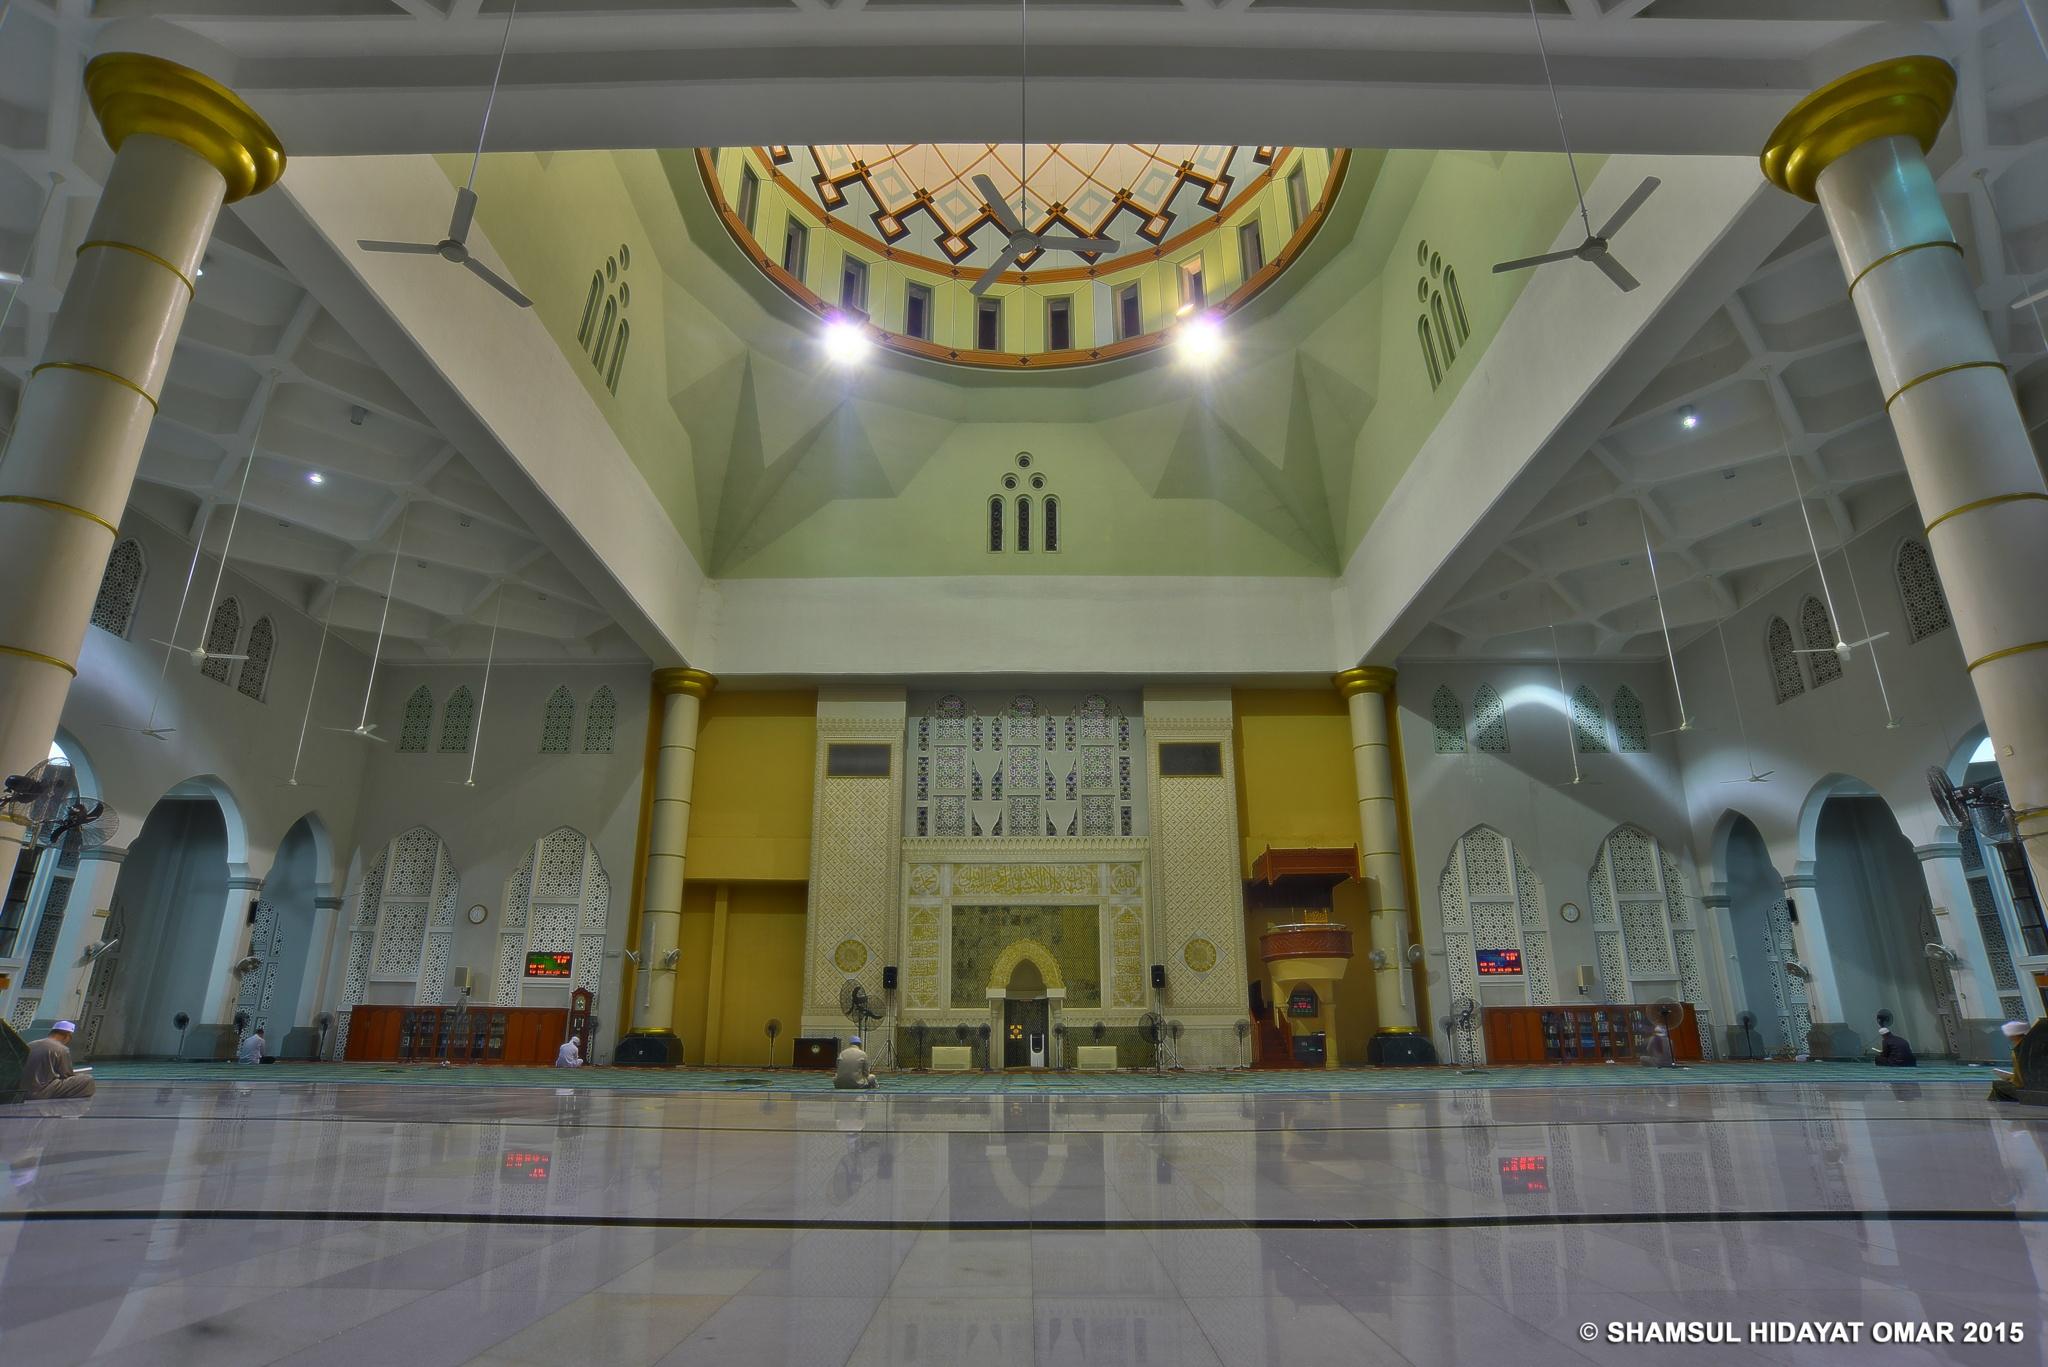 Masjid Bandaraya Kota Kinabalu (Interior) by ShamsulHidayatOmar